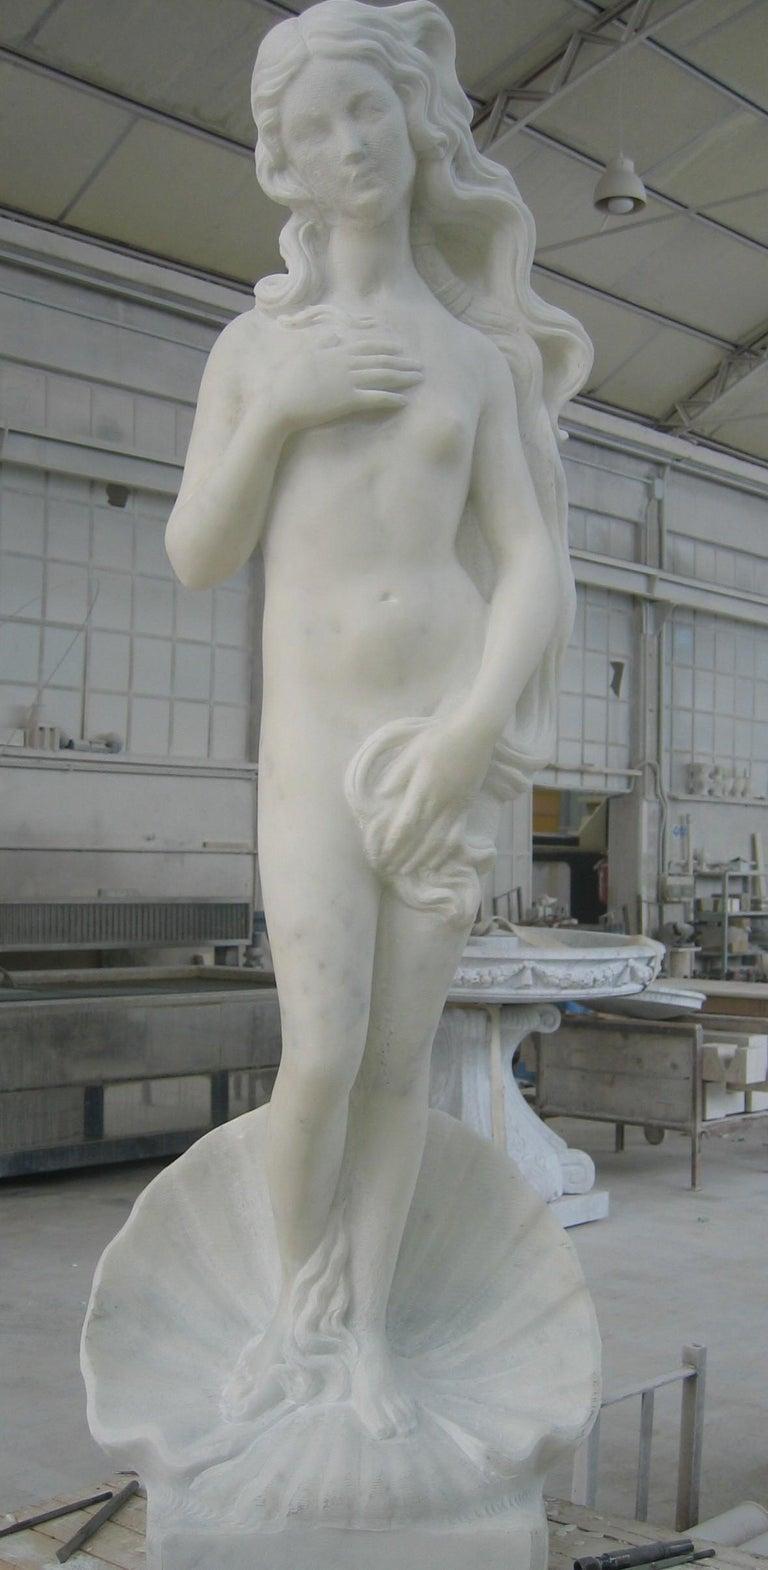 Modern Venere Statue in Acquabianca Marble by Kreoo For Sale